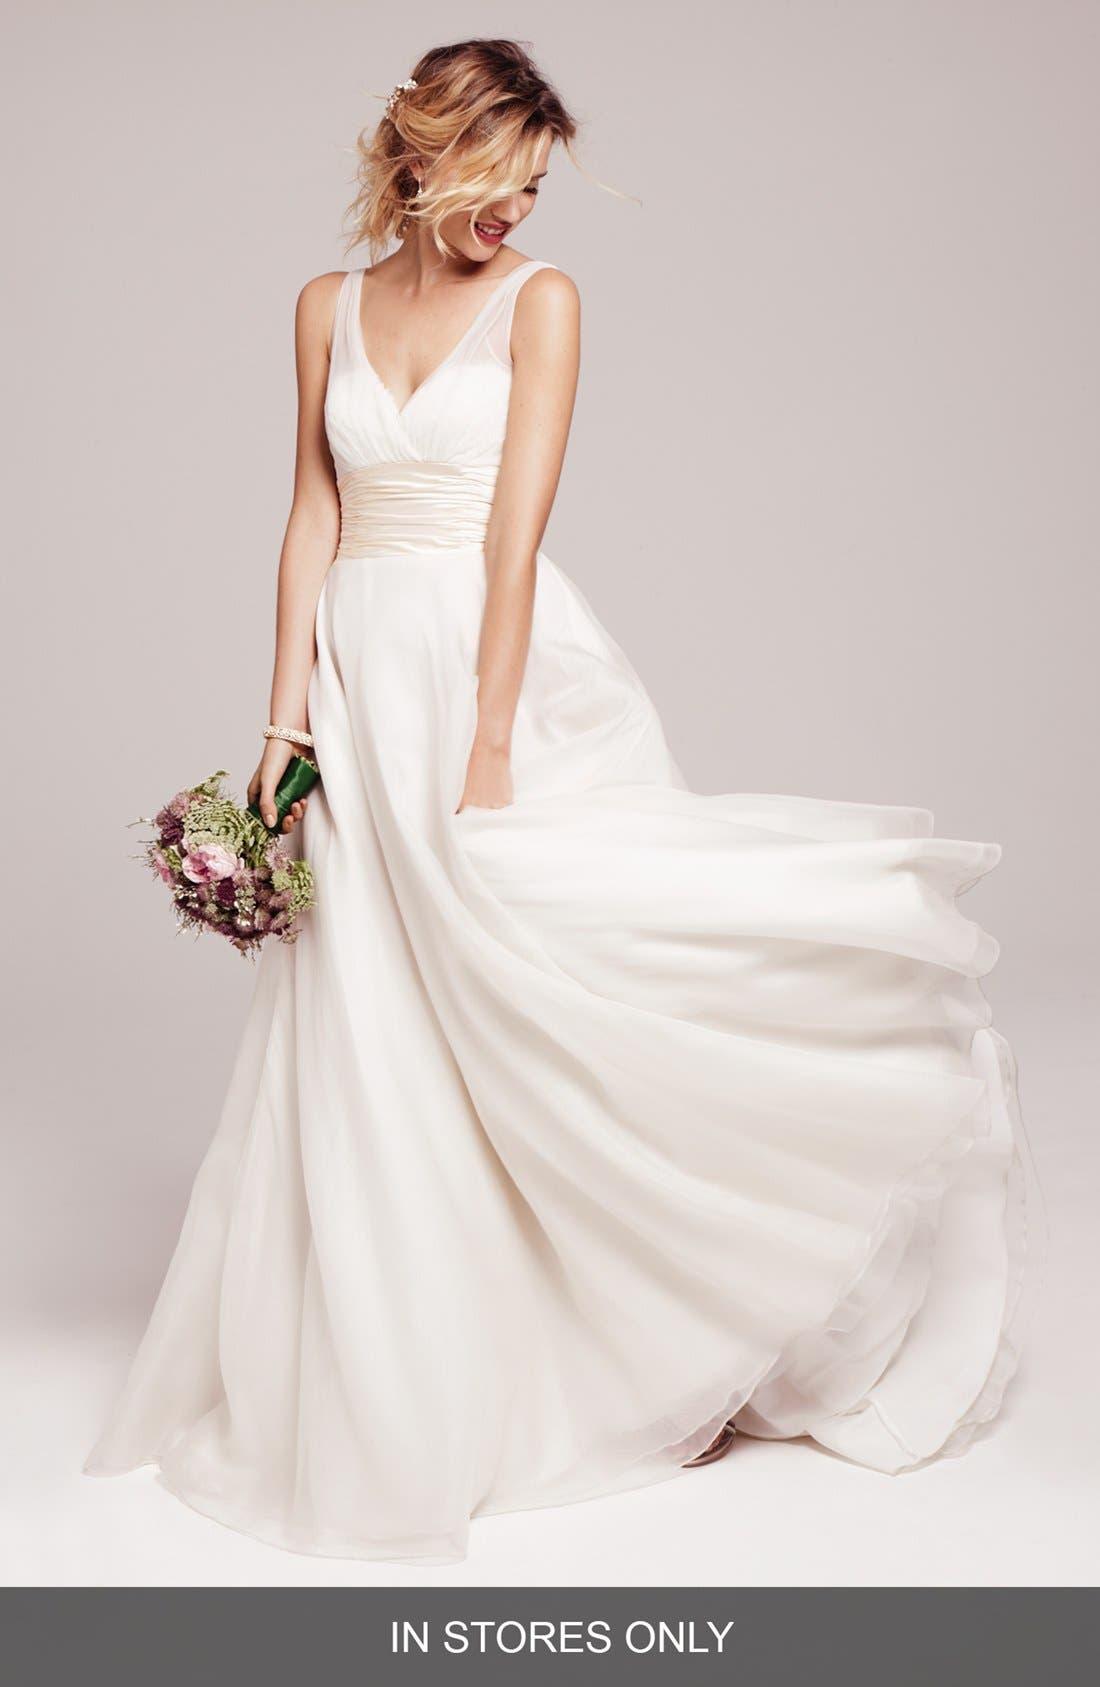 Alternate Image 1 Selected - Anne Barge Satin Cummerbund Silk Dress (In Stores Only)